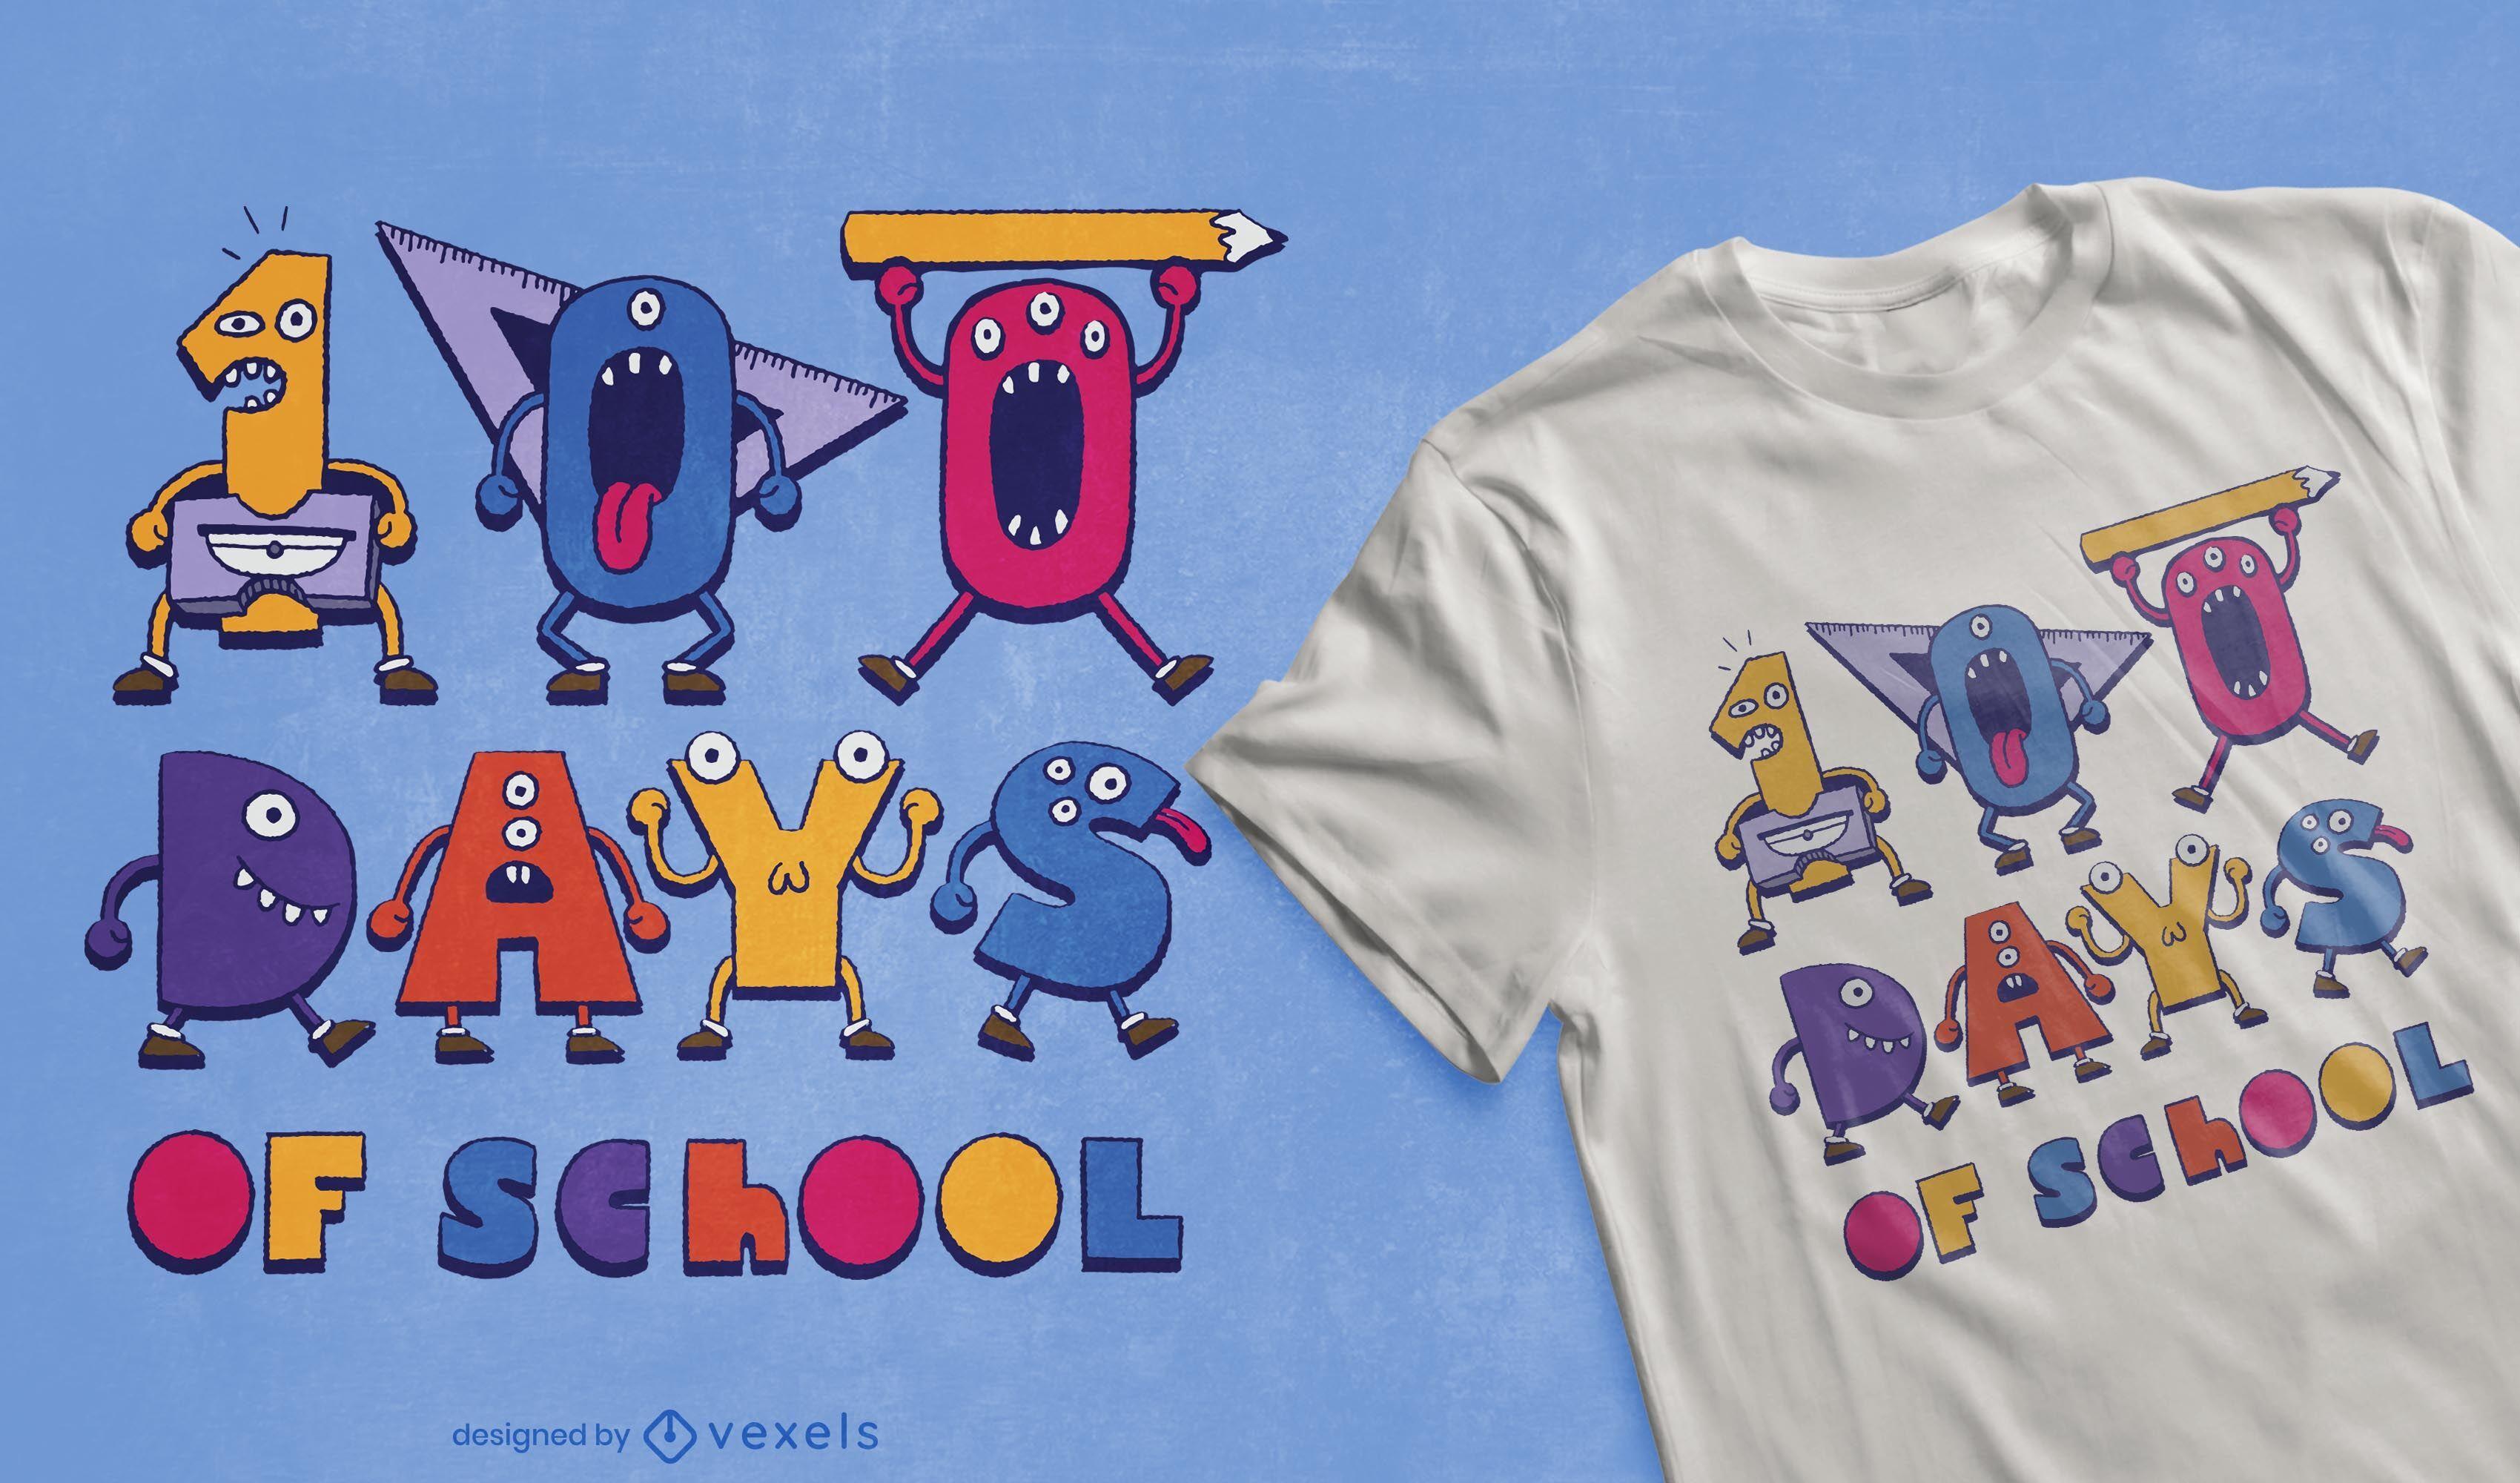 100 Days of School t-shirt design